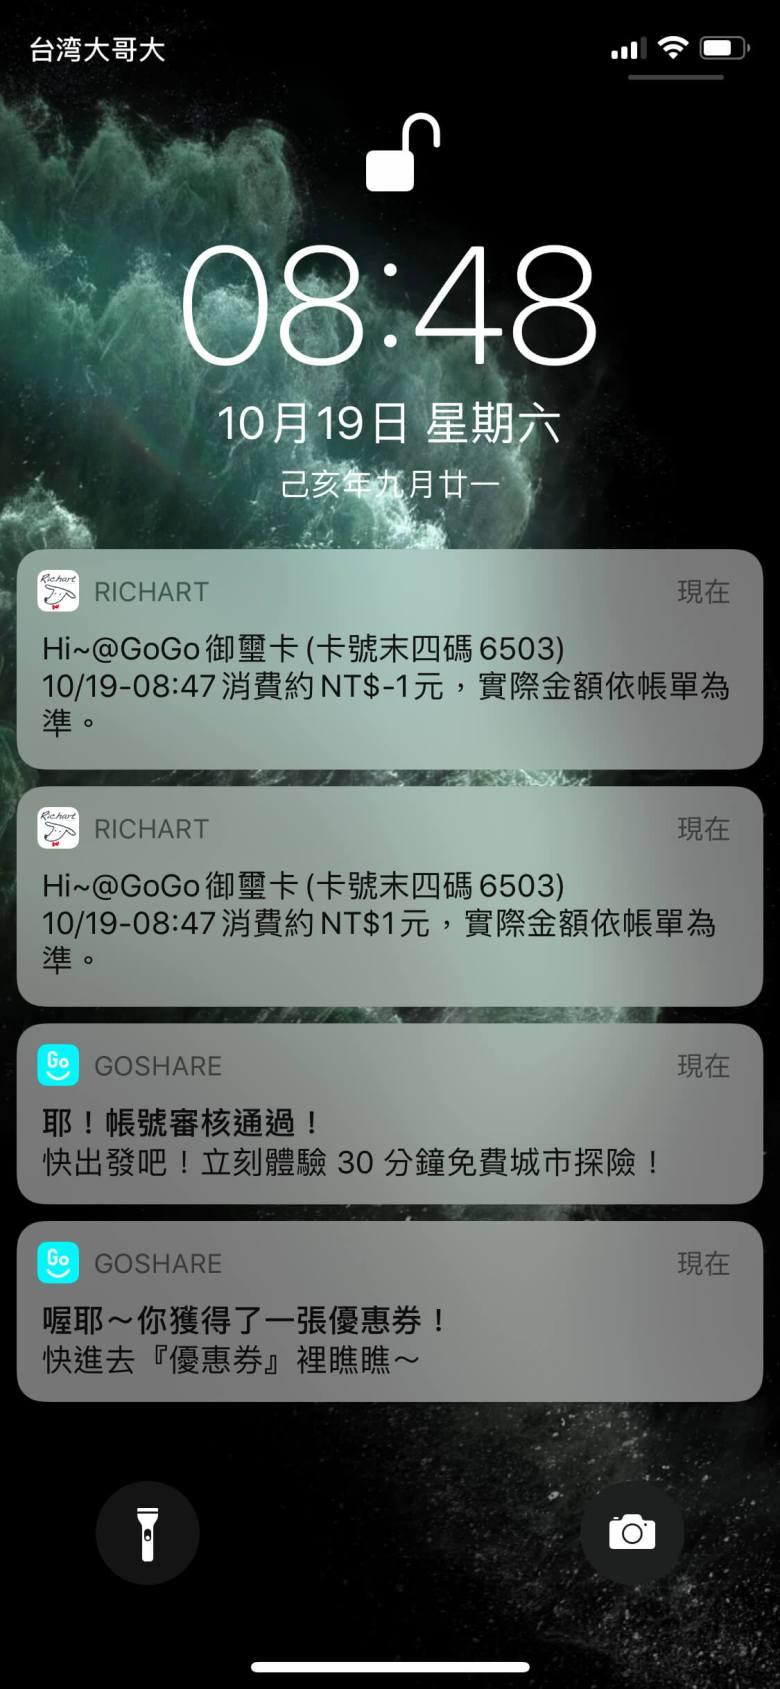 GoShare 推播通知 (1)